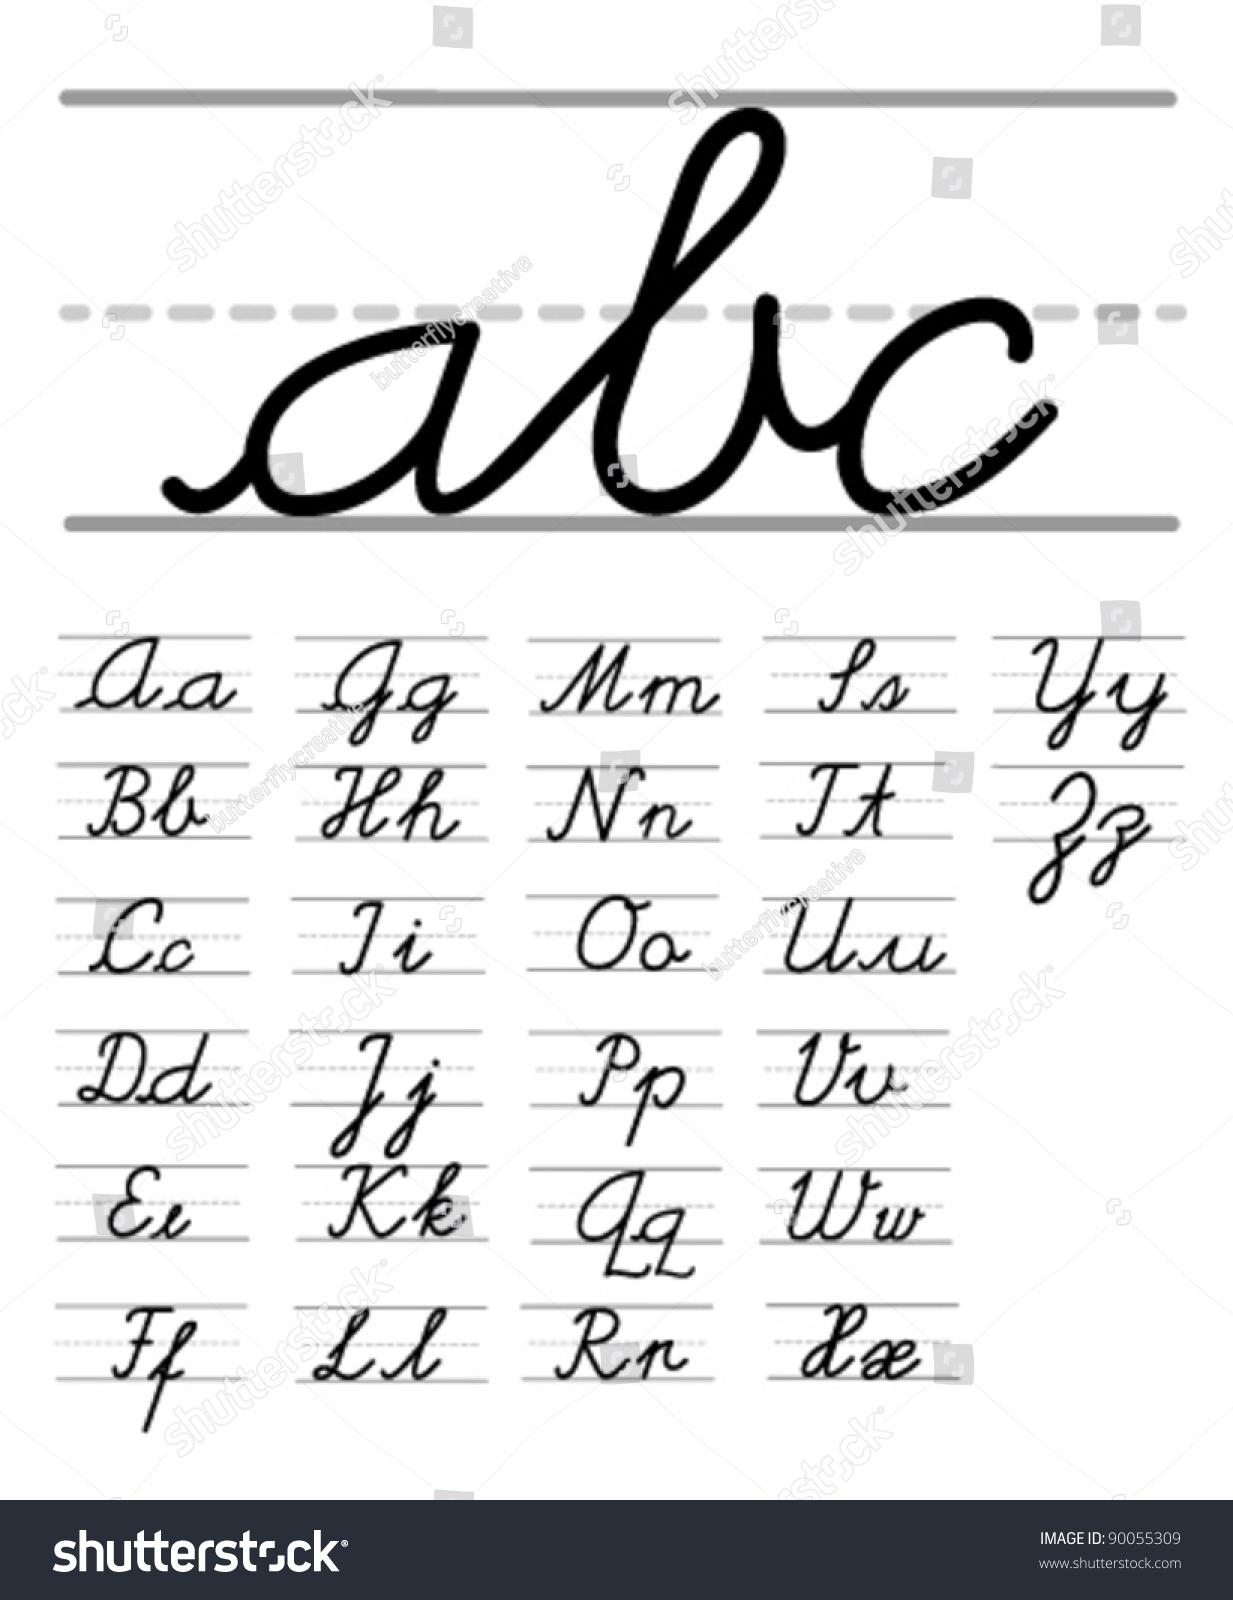 Worksheet Alphabet Handwriting vector handwriting alphabet stock 90055309 shutterstock alphabet